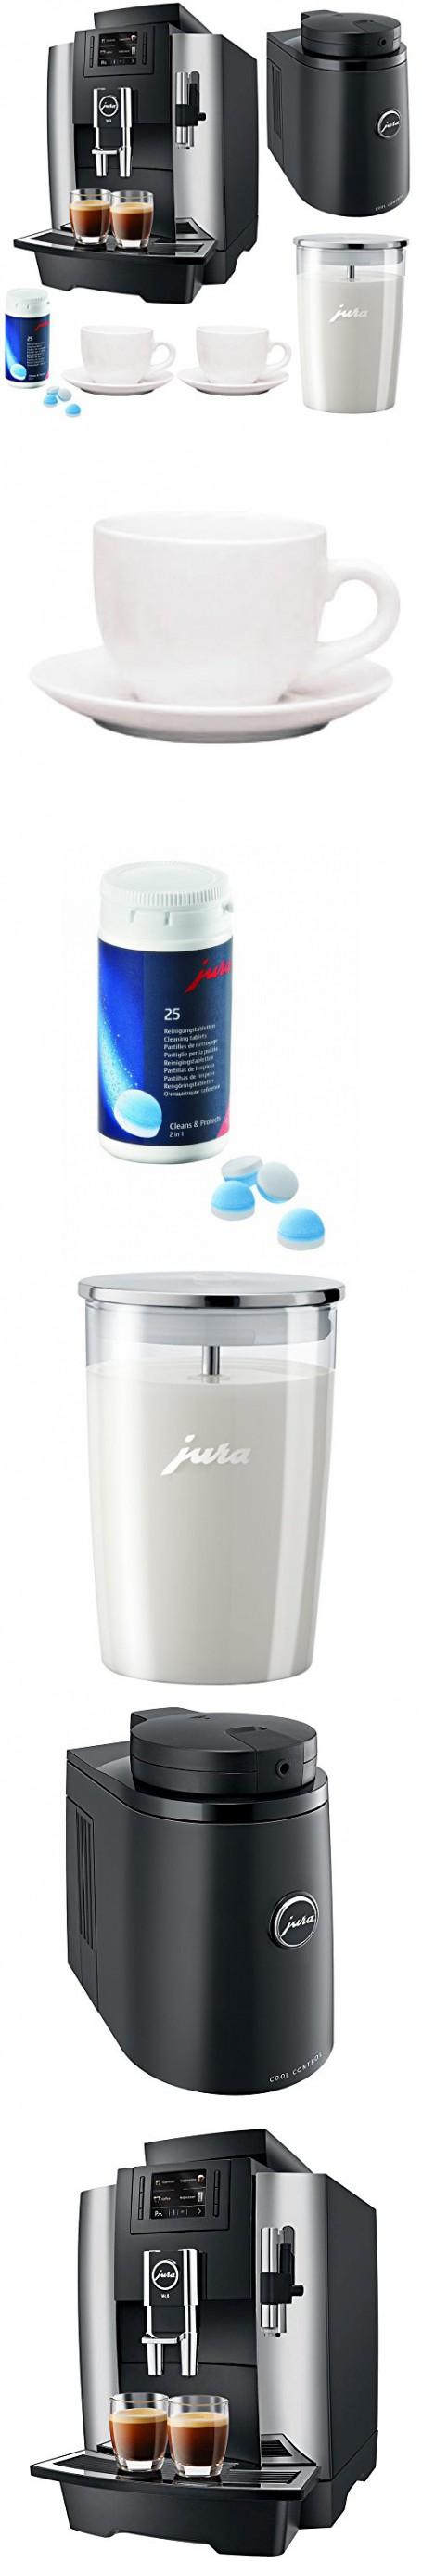 Jura WE8 Professional Coffee Machine Bundle Super